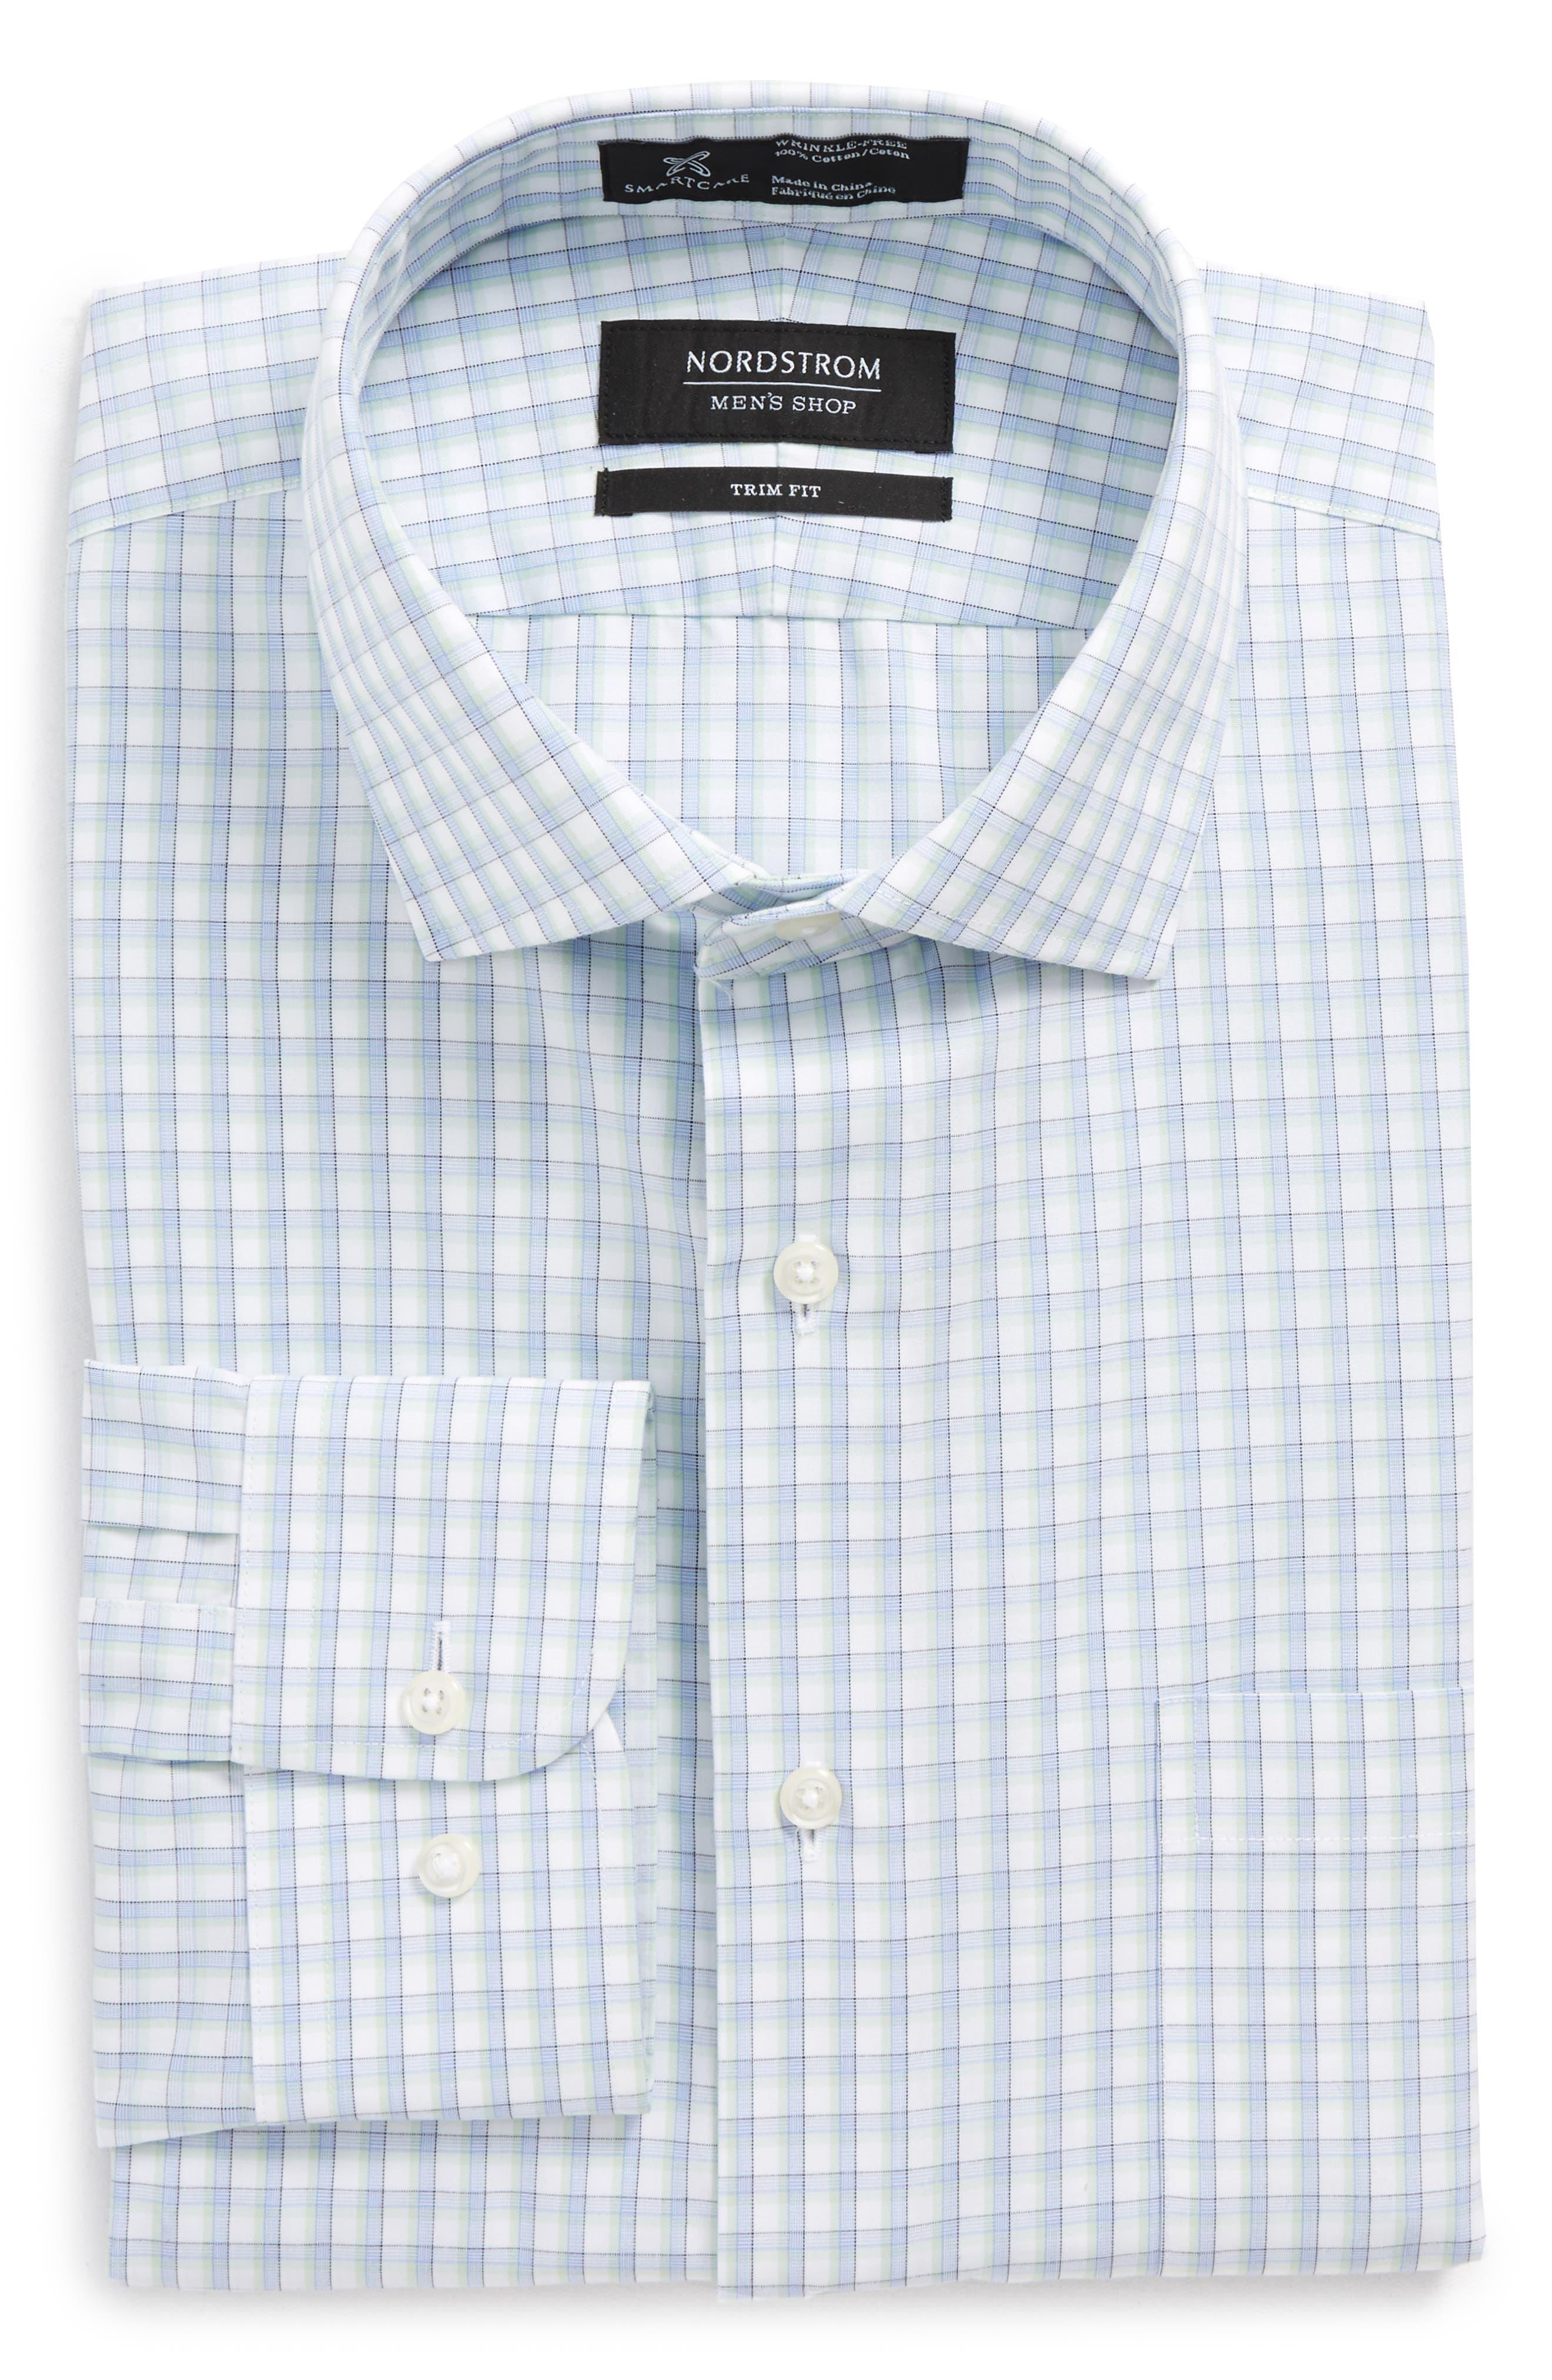 Nordstrom Men's Shop Smartcare™ Trim Fit Check Dress Shirt (Regular, Big & Tall)